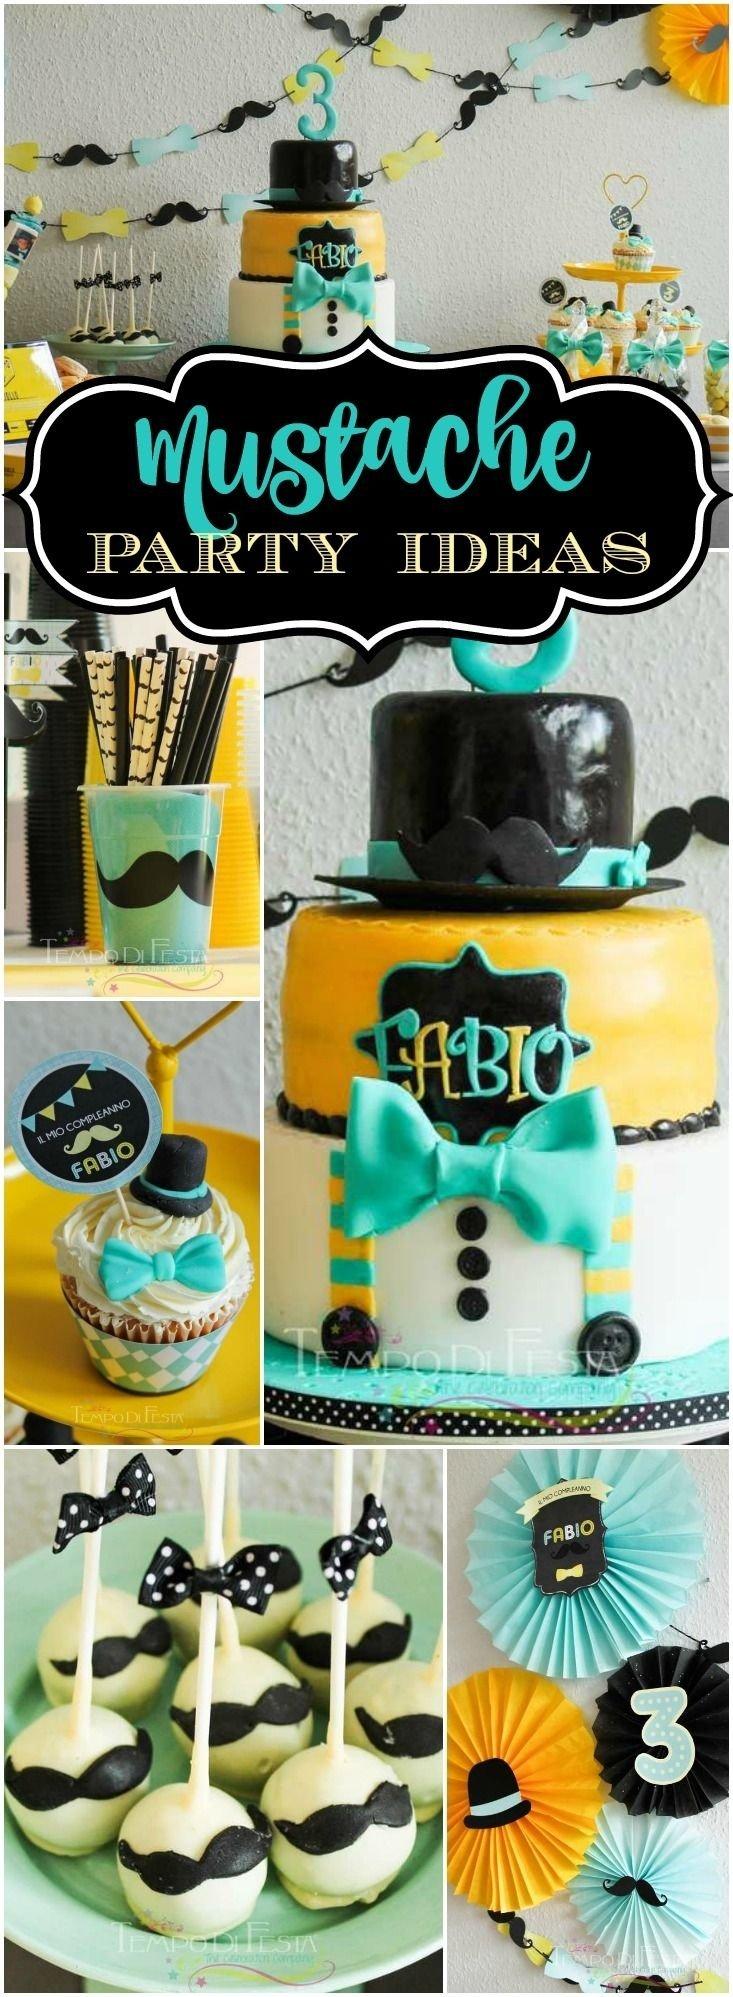 10 Famous Mustache Party Ideas For Kids 267 best mustache bash party ideas images on pinterest anniversary 2